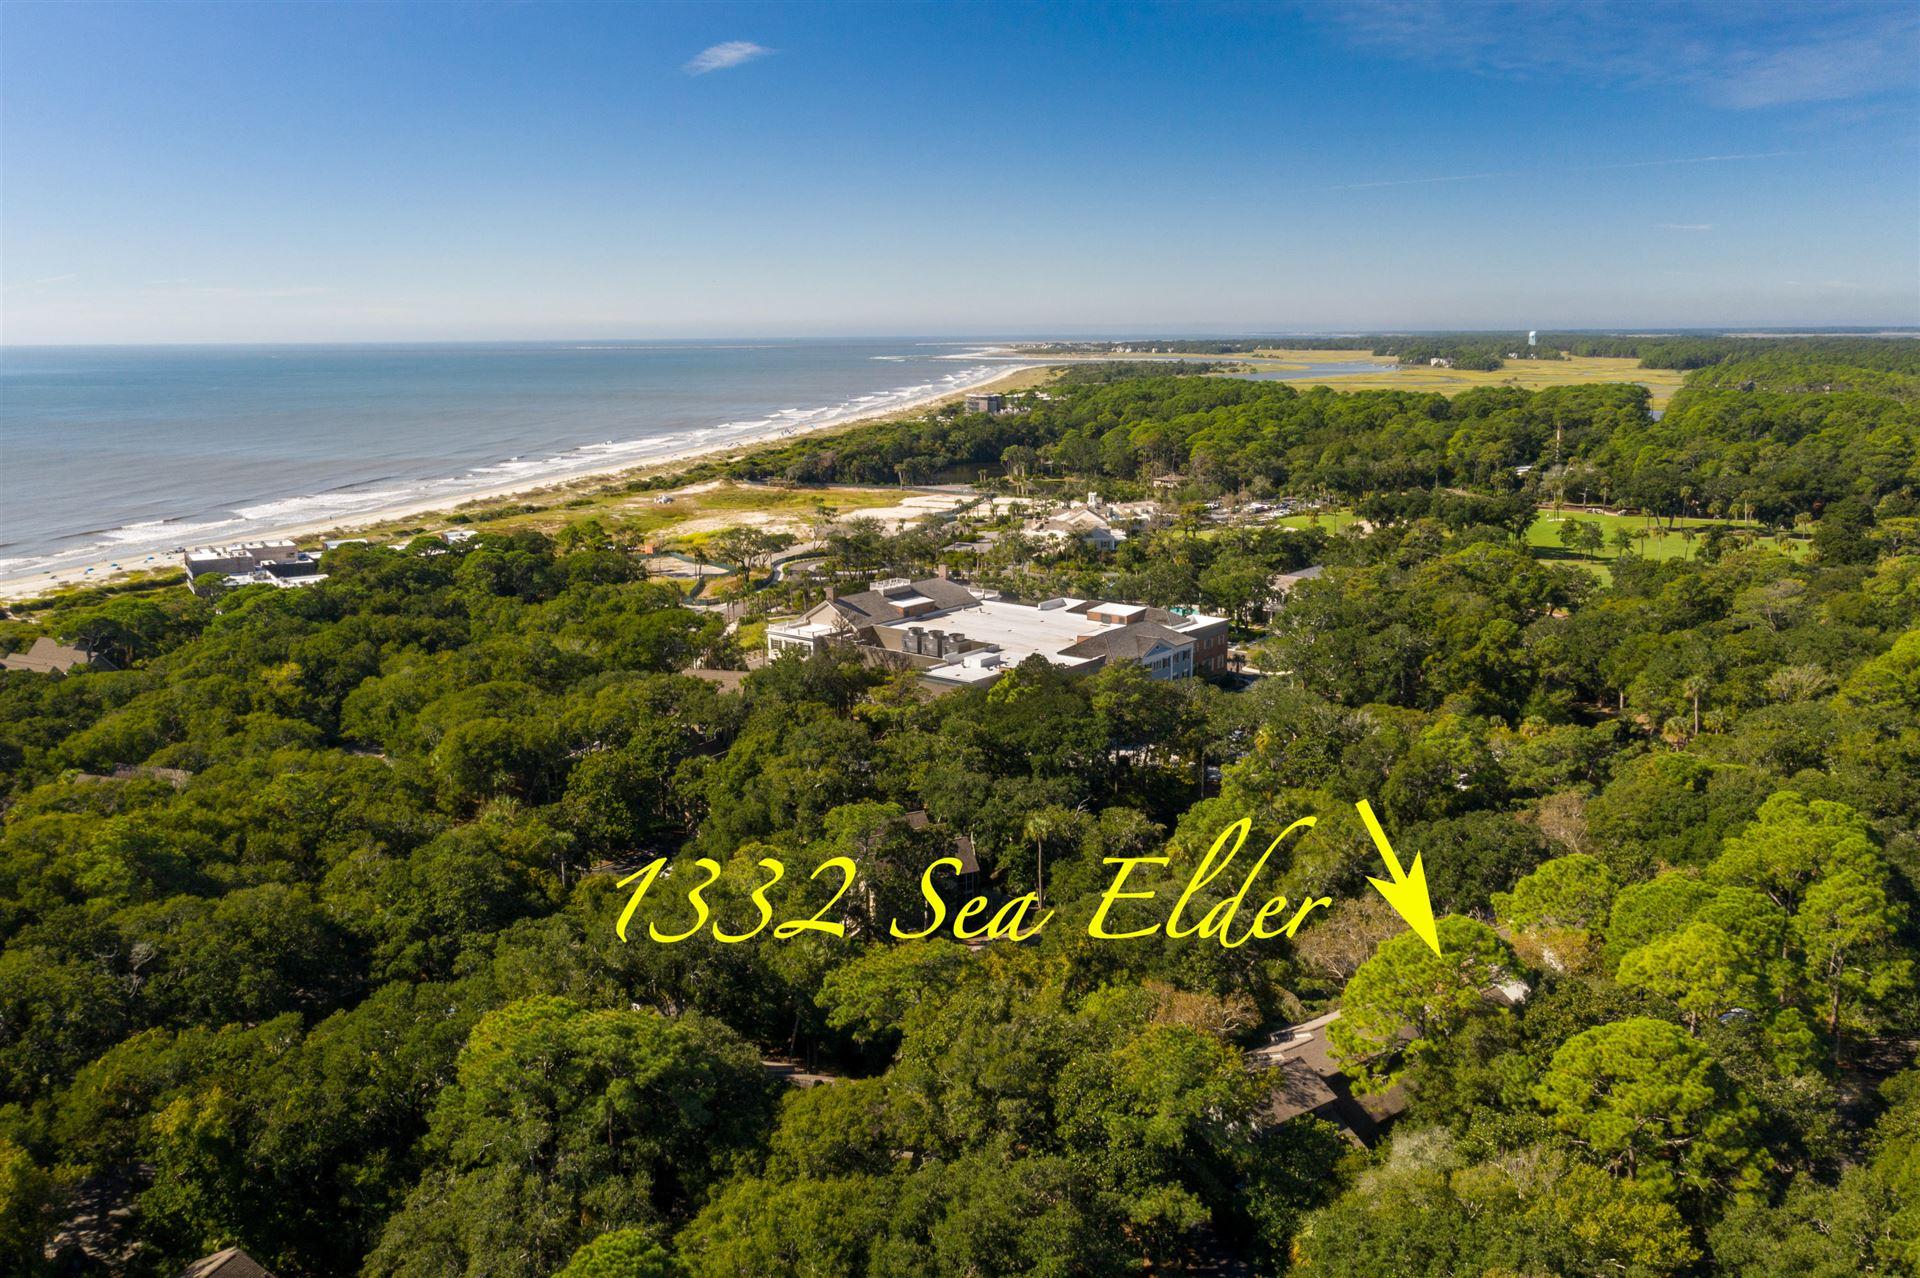 1332 Sea Elder Drive, Johns Island, SC 29455 - #: 20028109